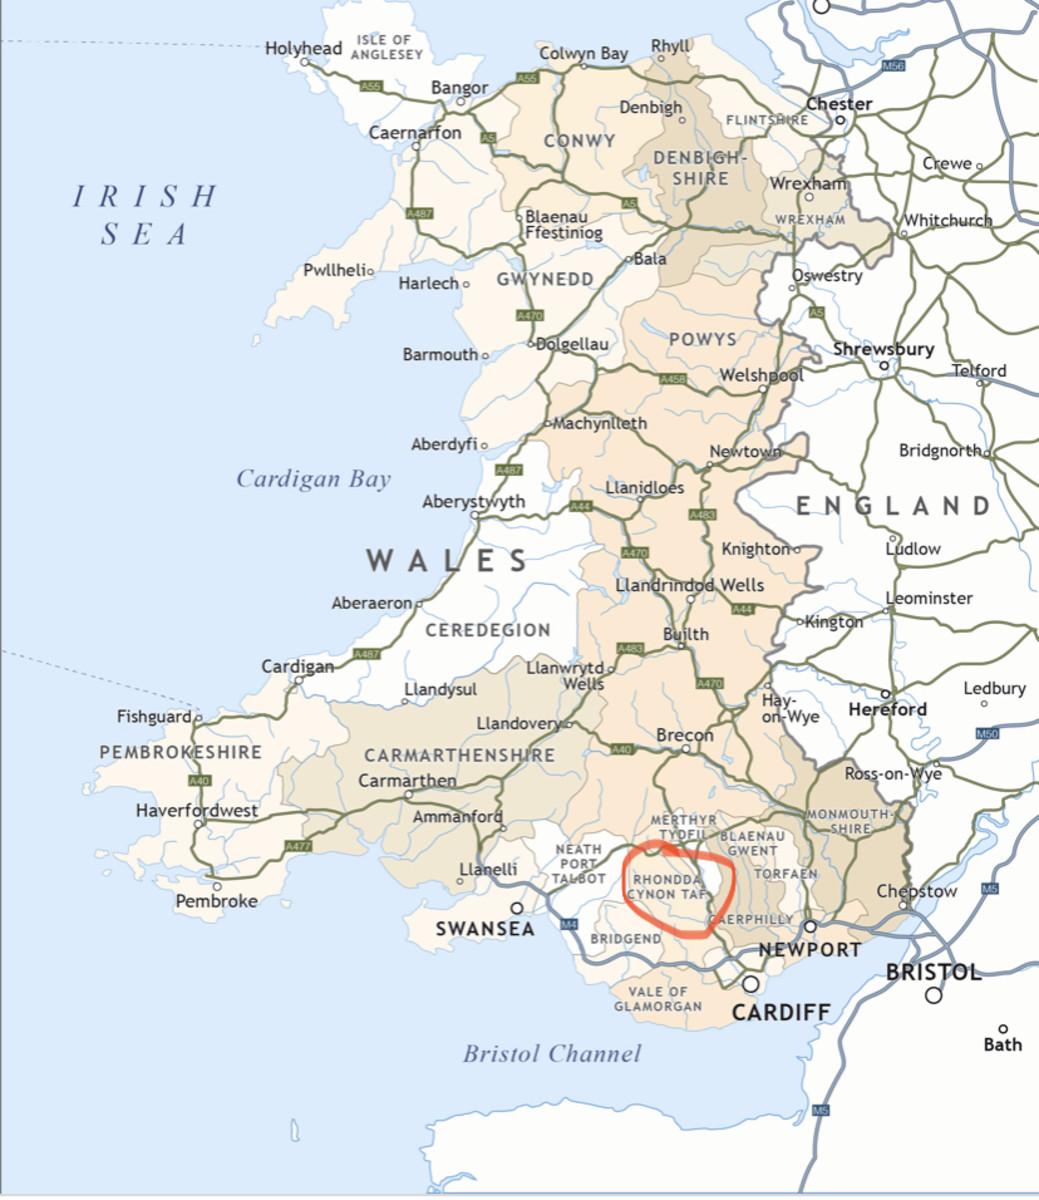 Llanharan, located in the Rhondda Cynon Taf in South Wales.